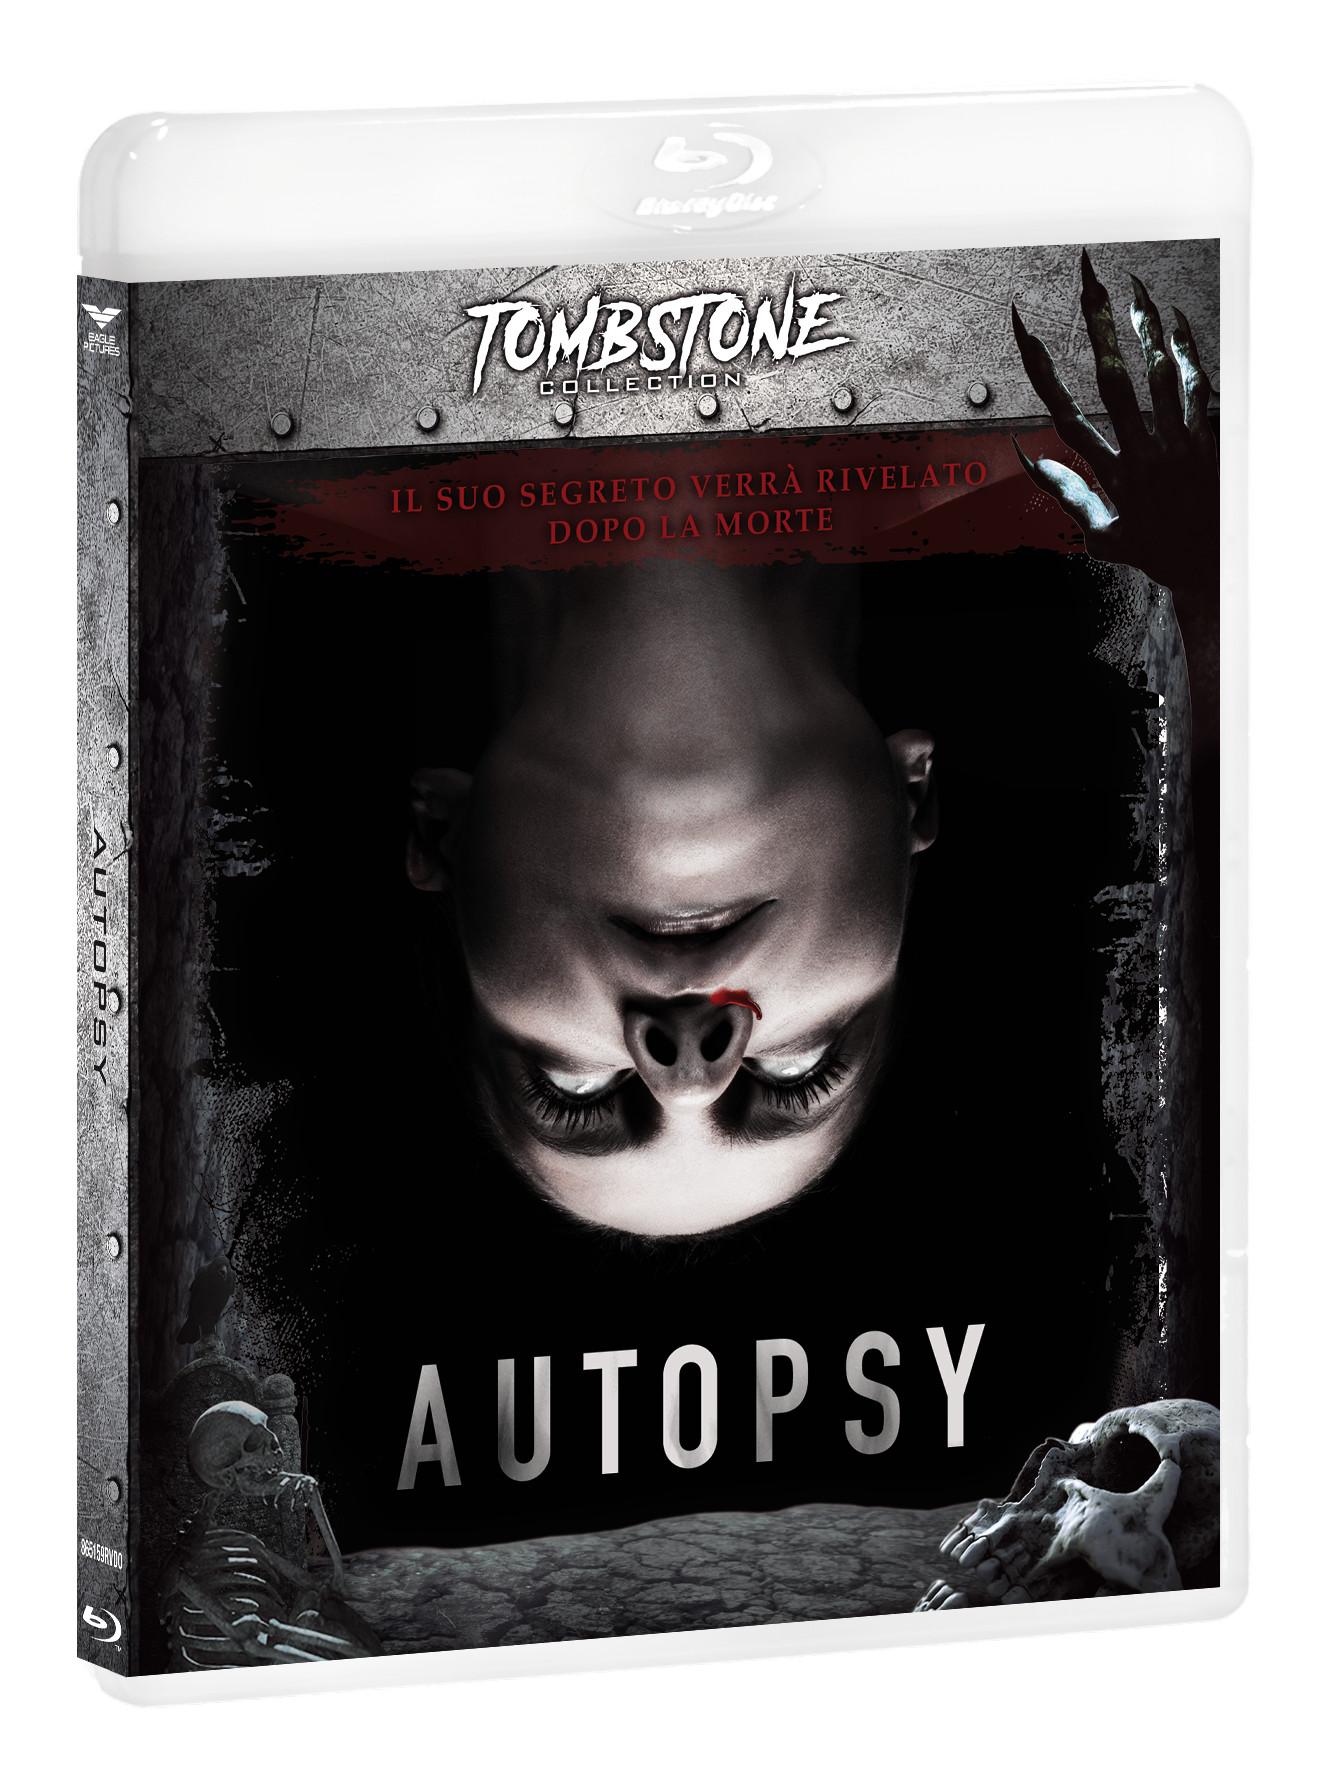 AUTOPSY (TOMBSTONE) RMX - BLU RAY